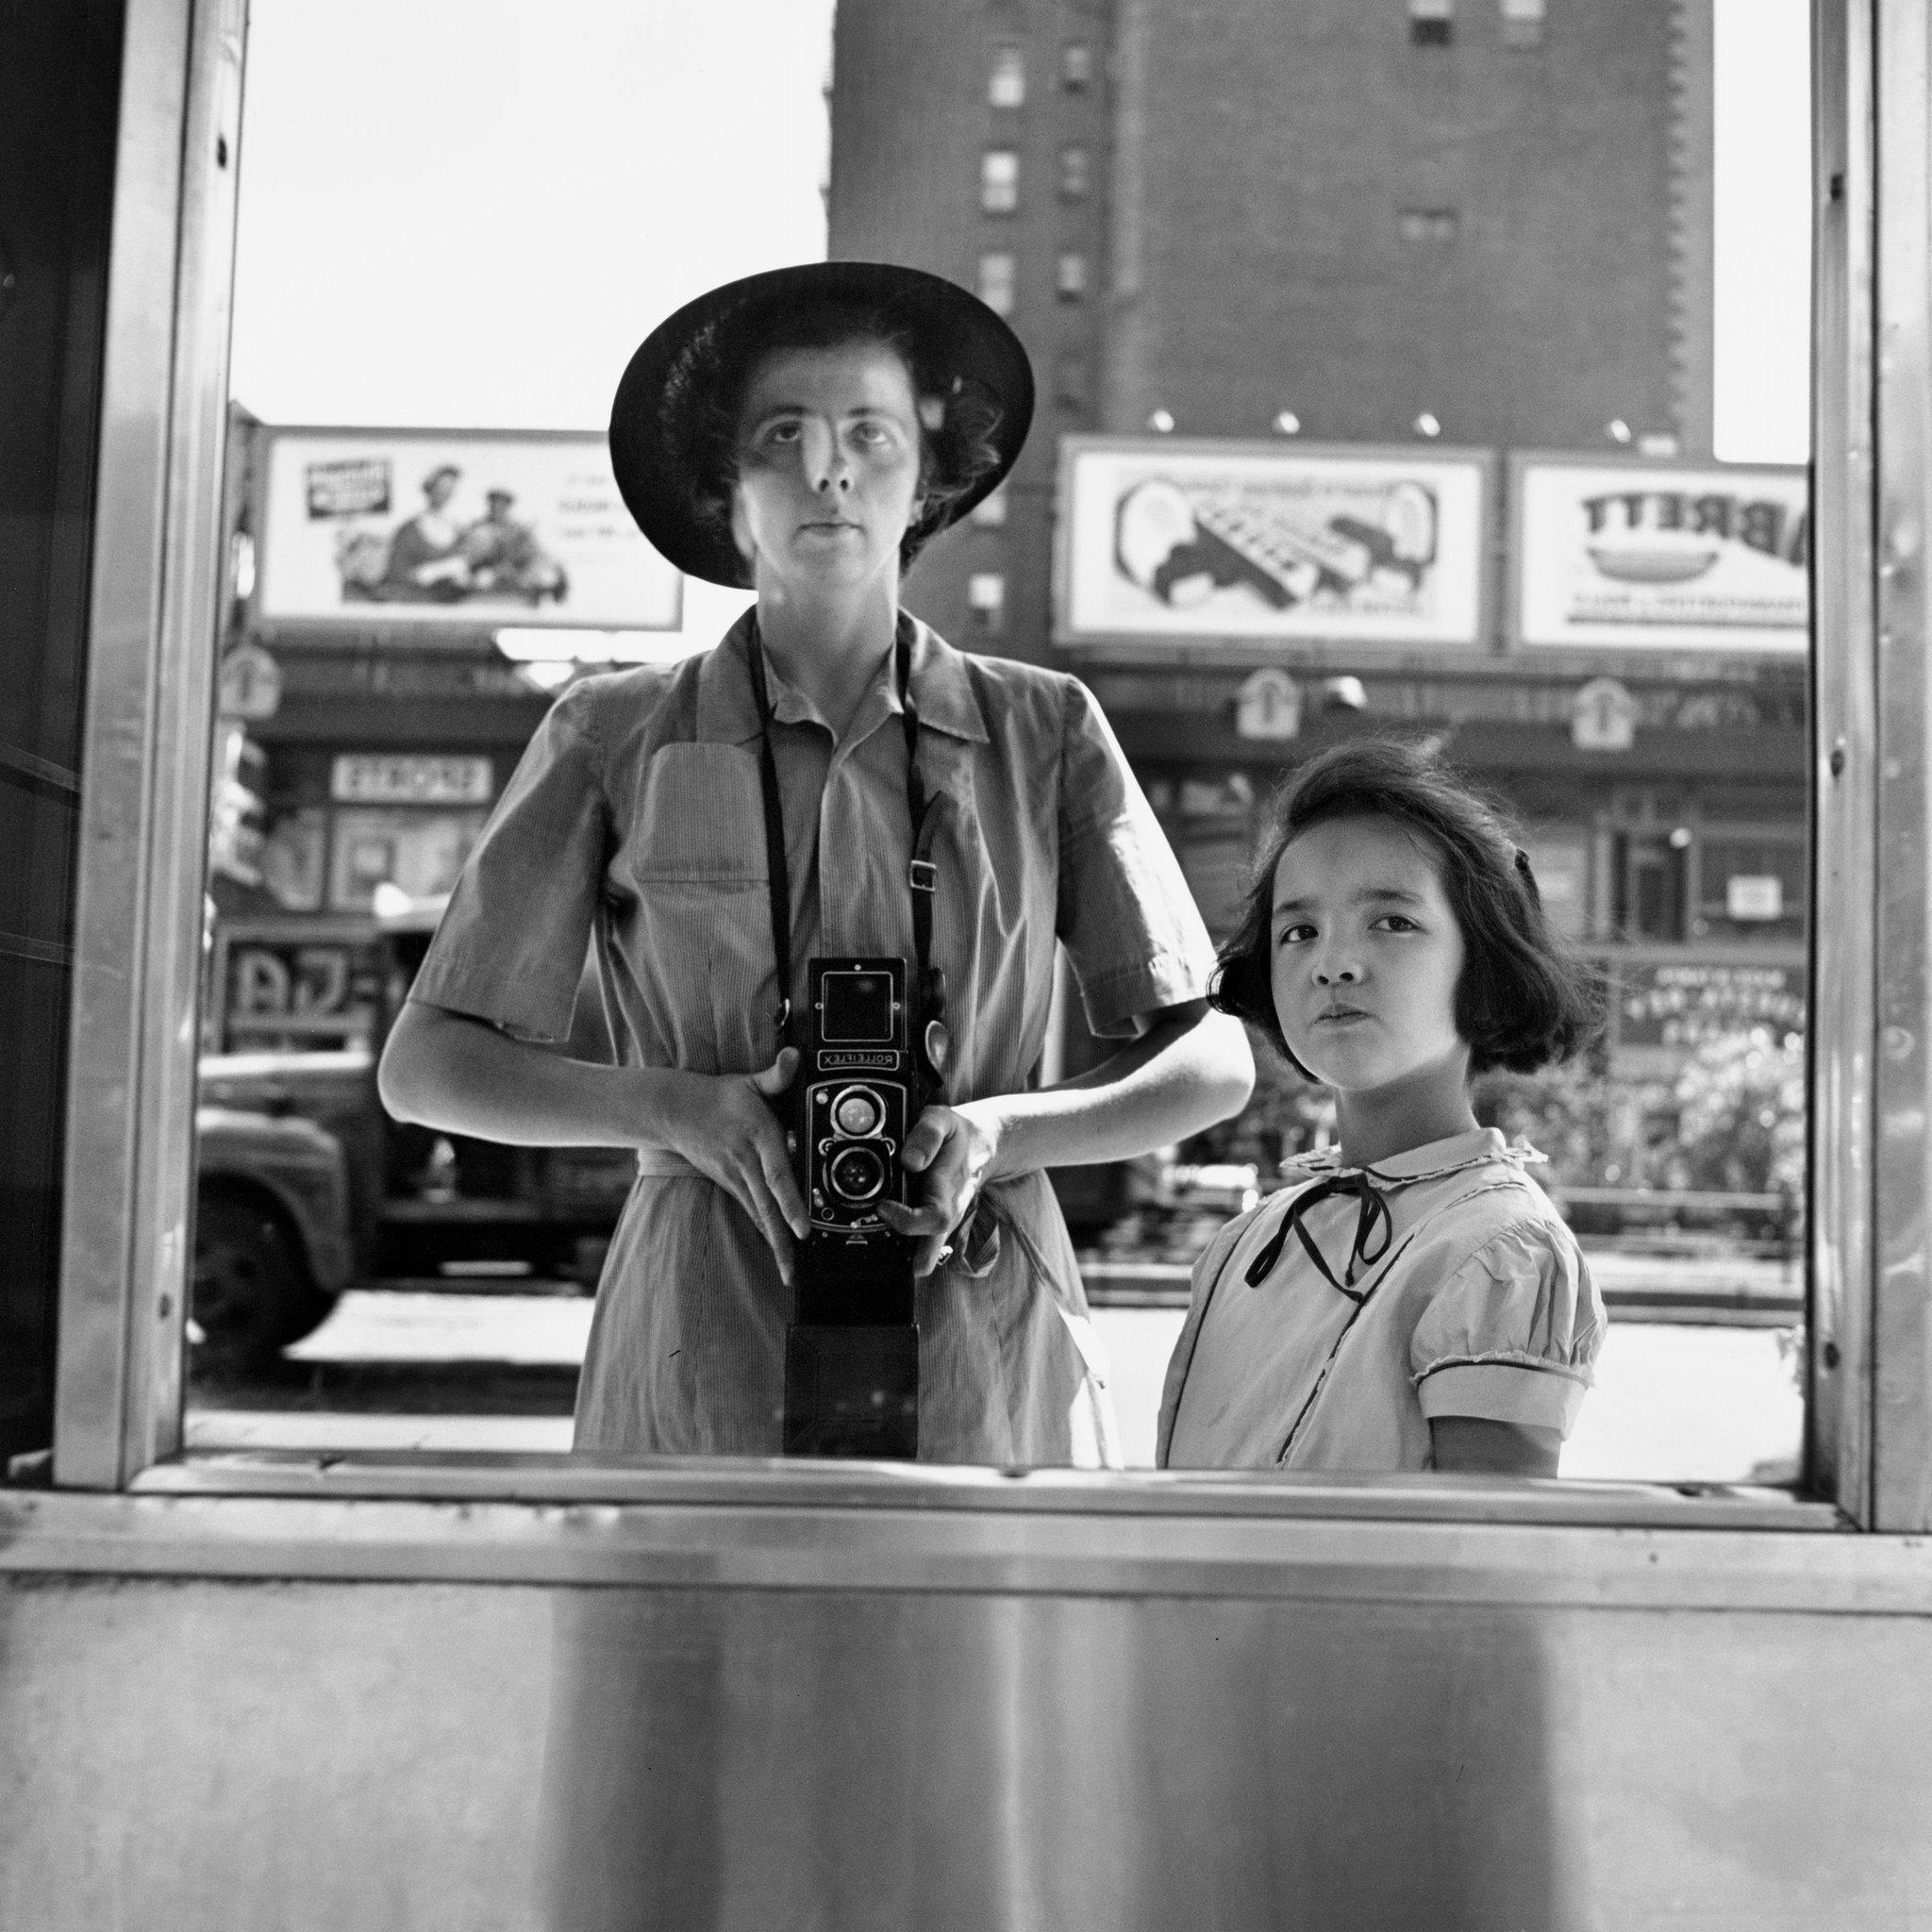 "Proyección ""Finding Vivian Maier"" en la @filmotecacat viernes 3 a las 19h #VivianMaierFotoColectania @FBSabadell https://t.co/pGaLxEzwTJ"